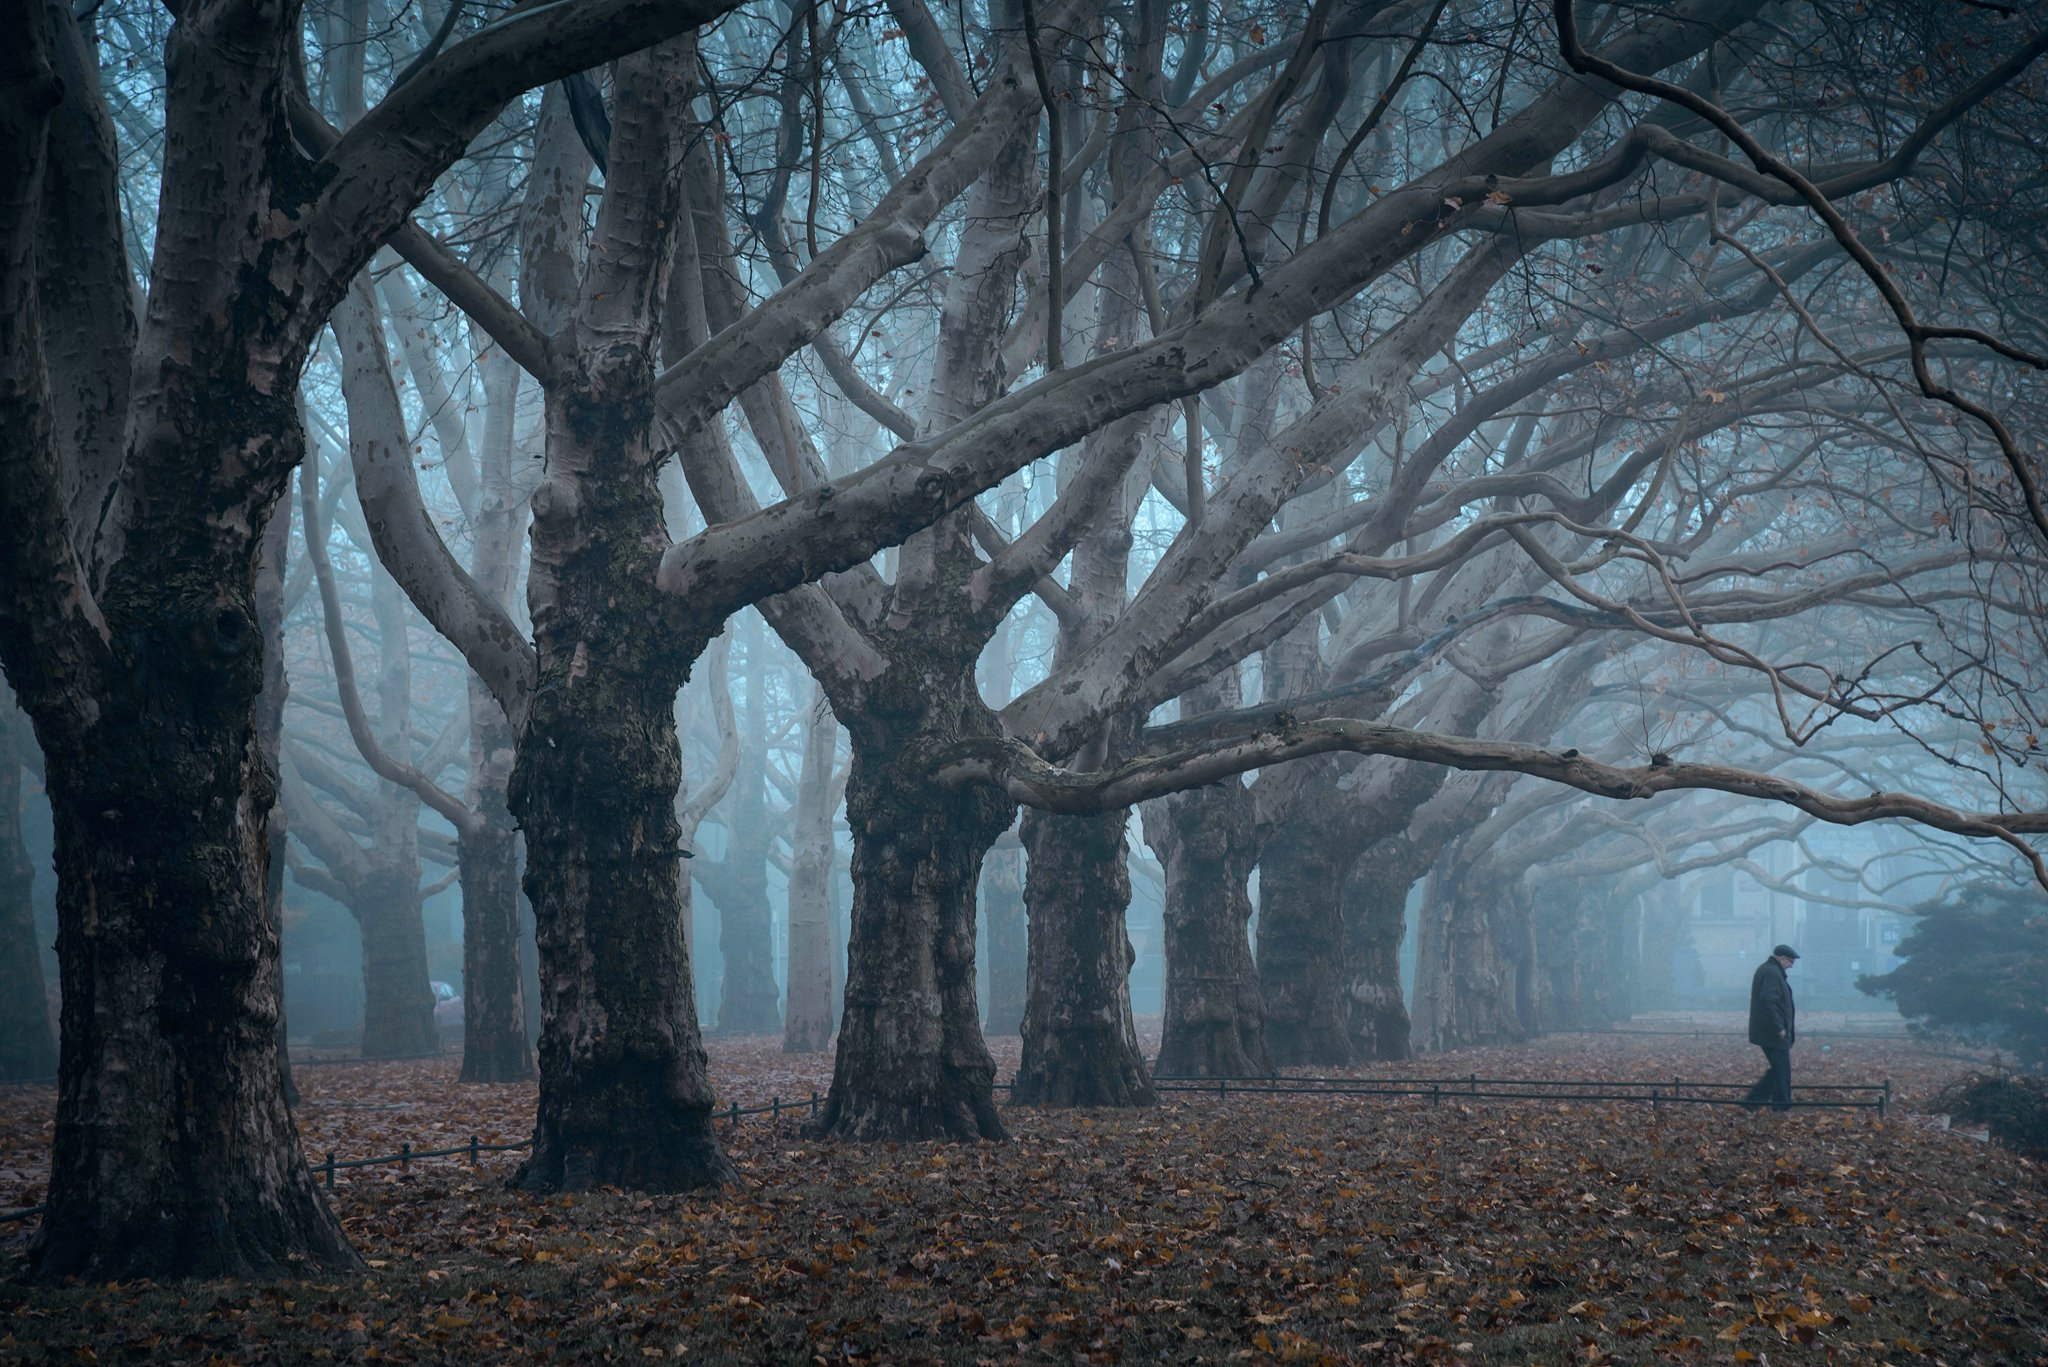 исчезающий vanishing old man trees dranikowski foggy morning platans tree path fog mist magic foggy, Radoslaw Dranikowski